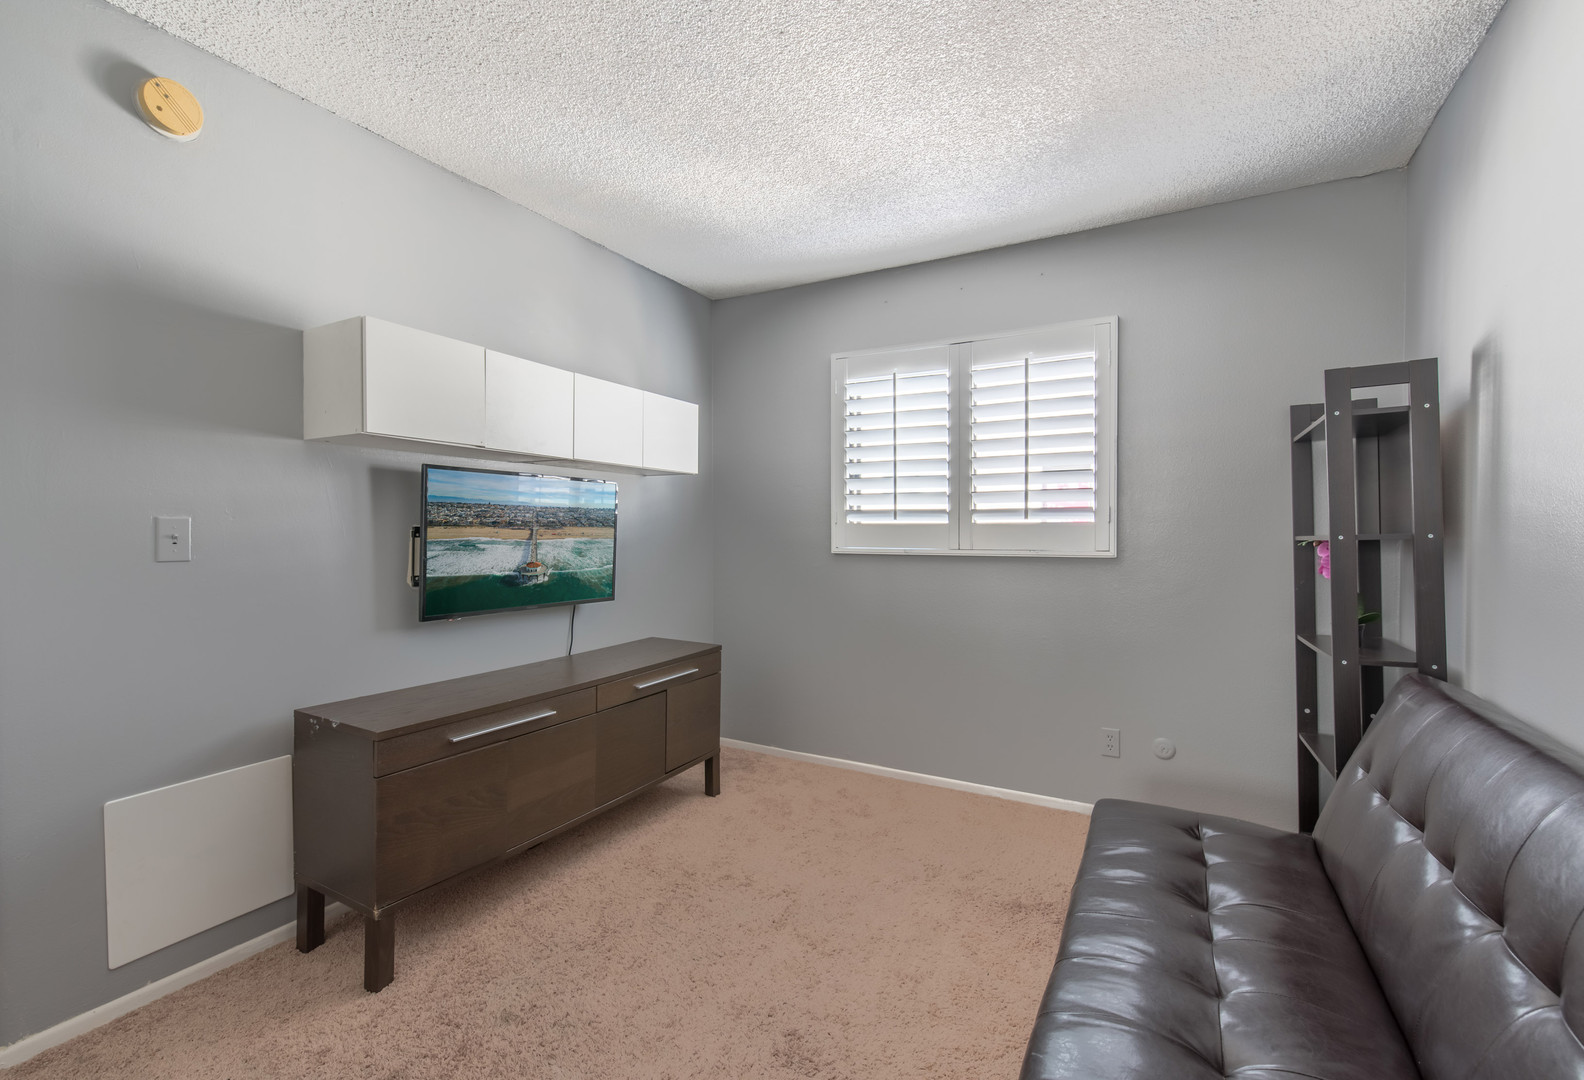 14 Bedroom 2-2.jpg